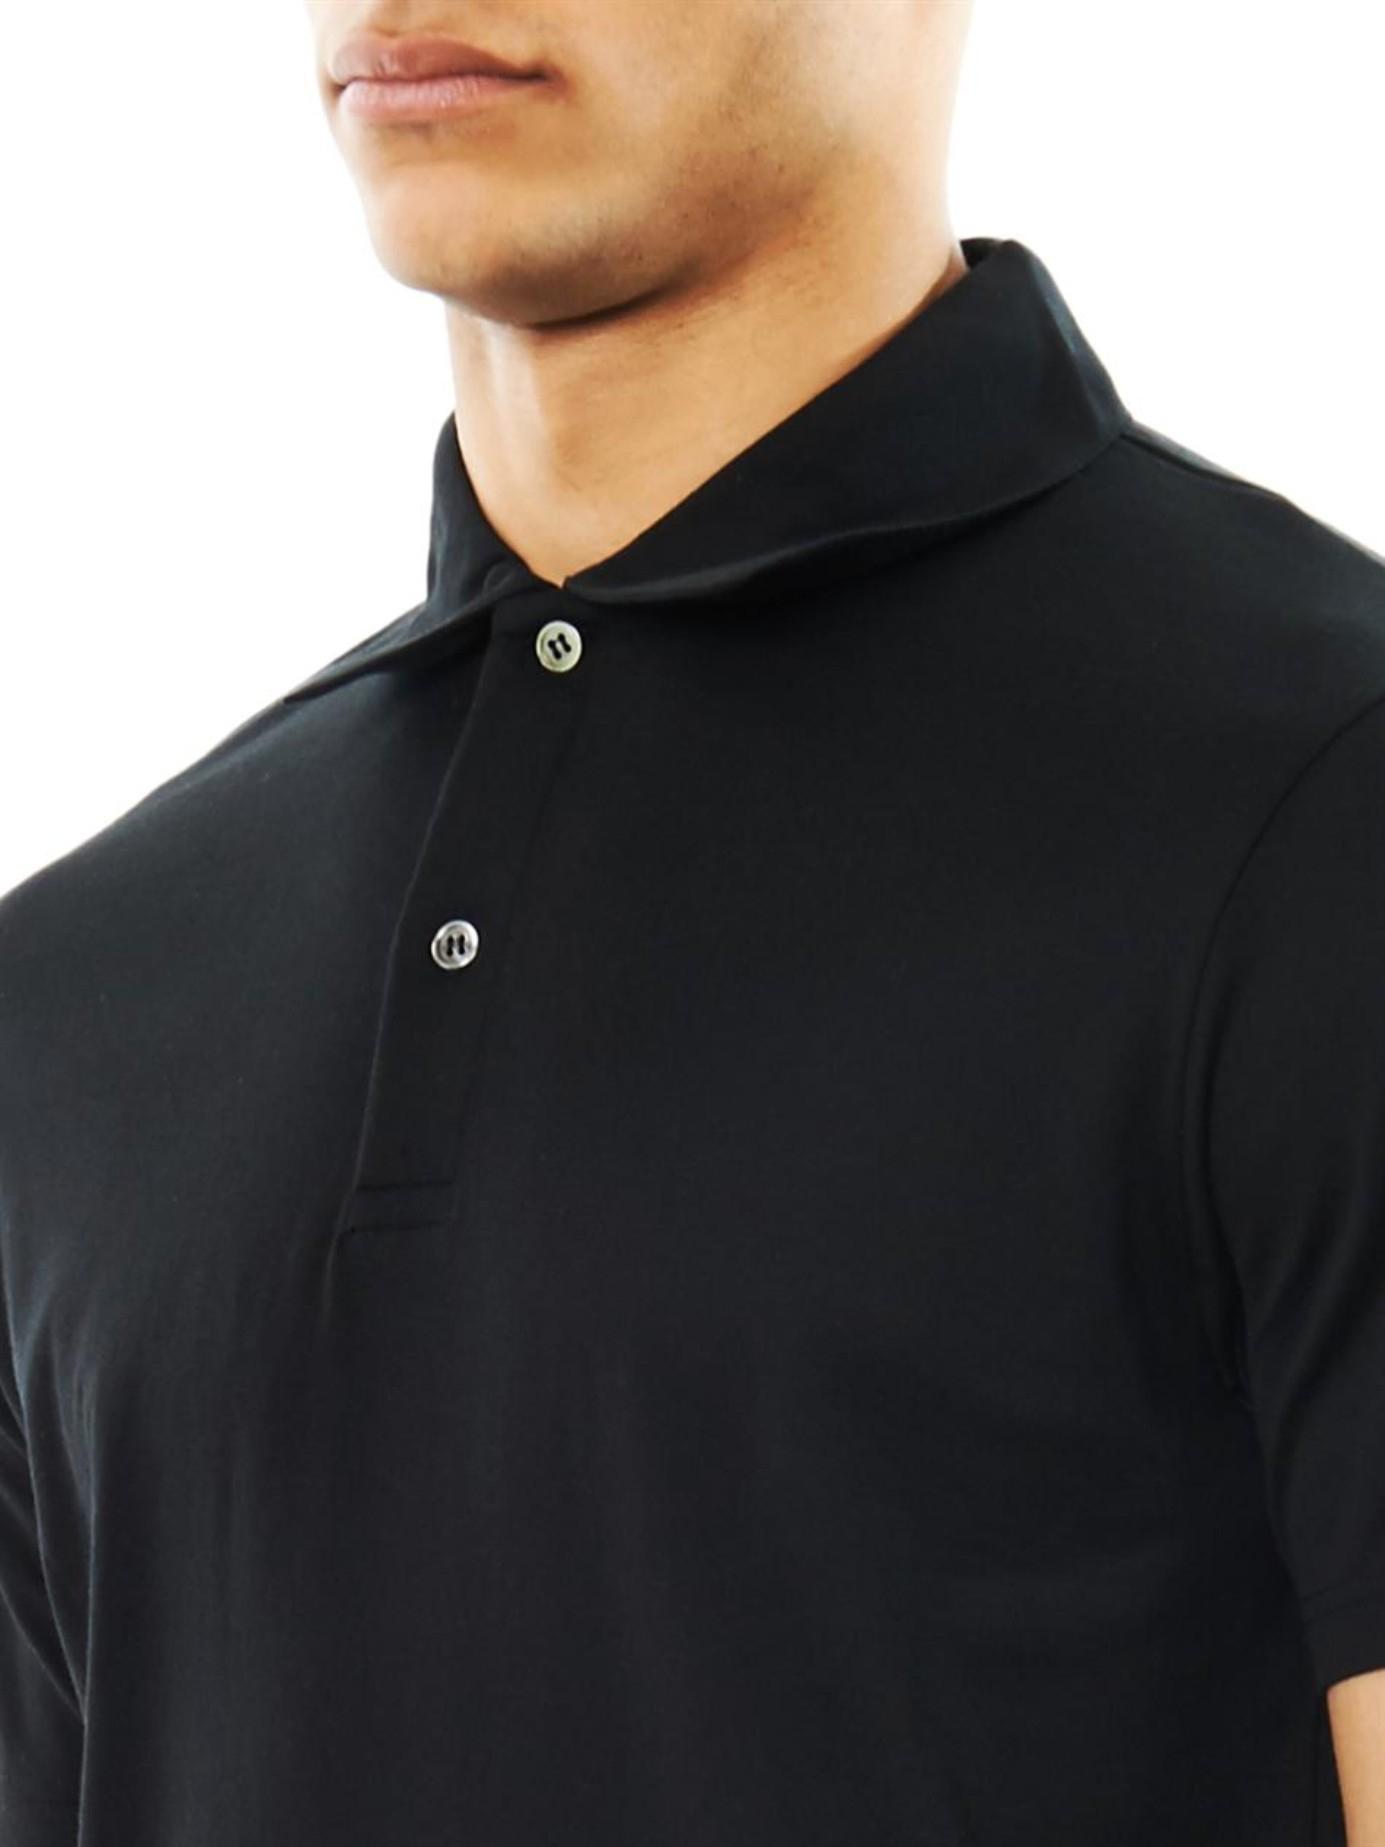 81ee342b Sunspel Cotton-jersey Polo Shirt in Black for Men - Lyst